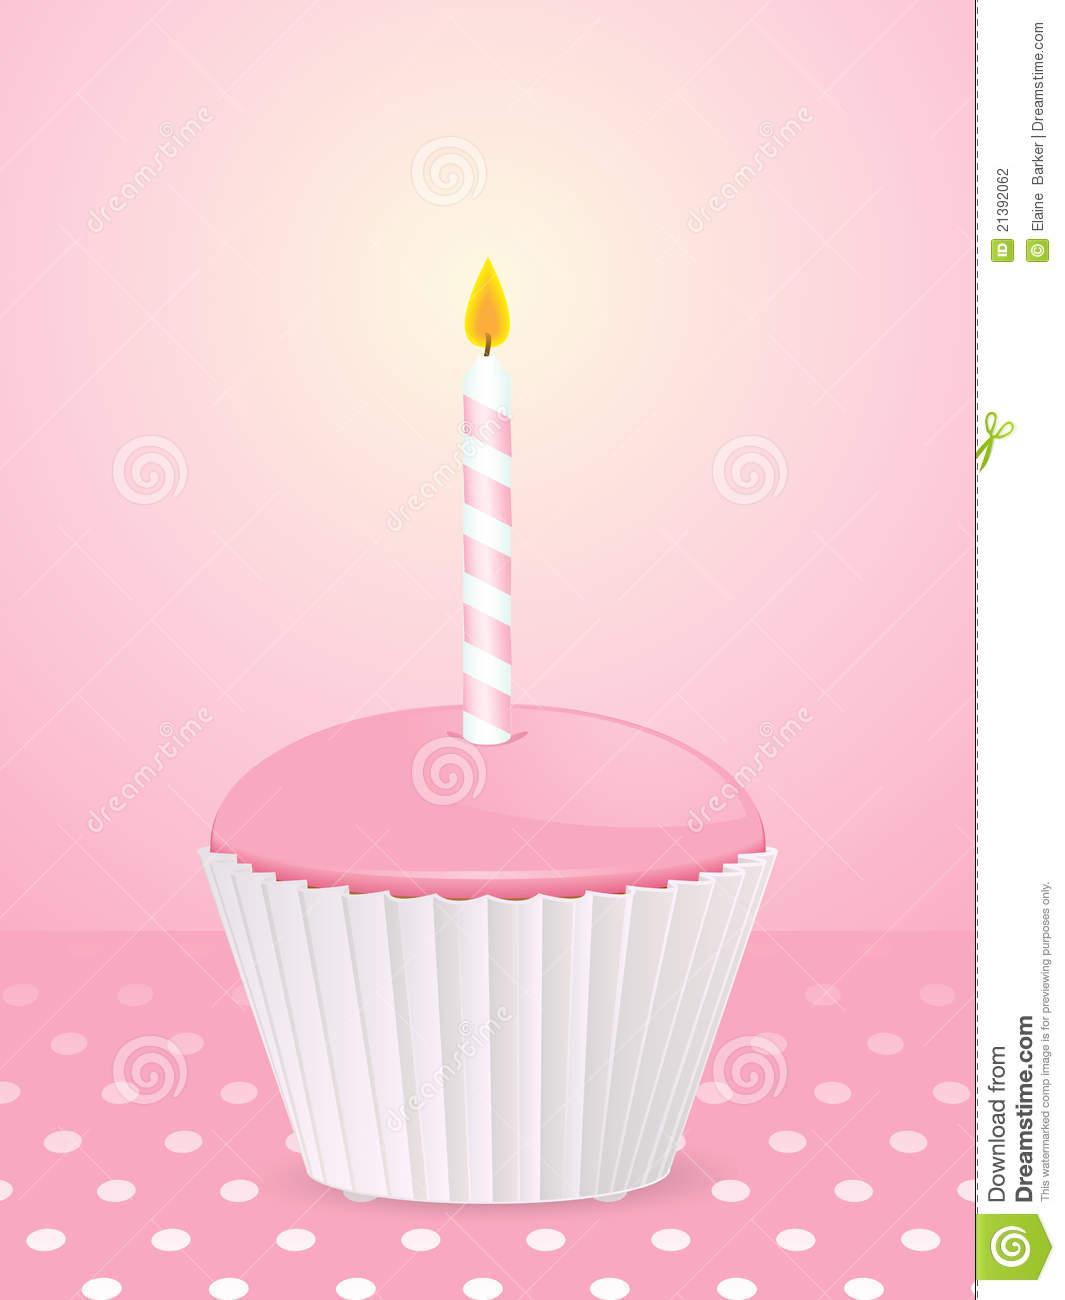 Cupcake Wallpaper: Birthday Cupcake Wallpaper